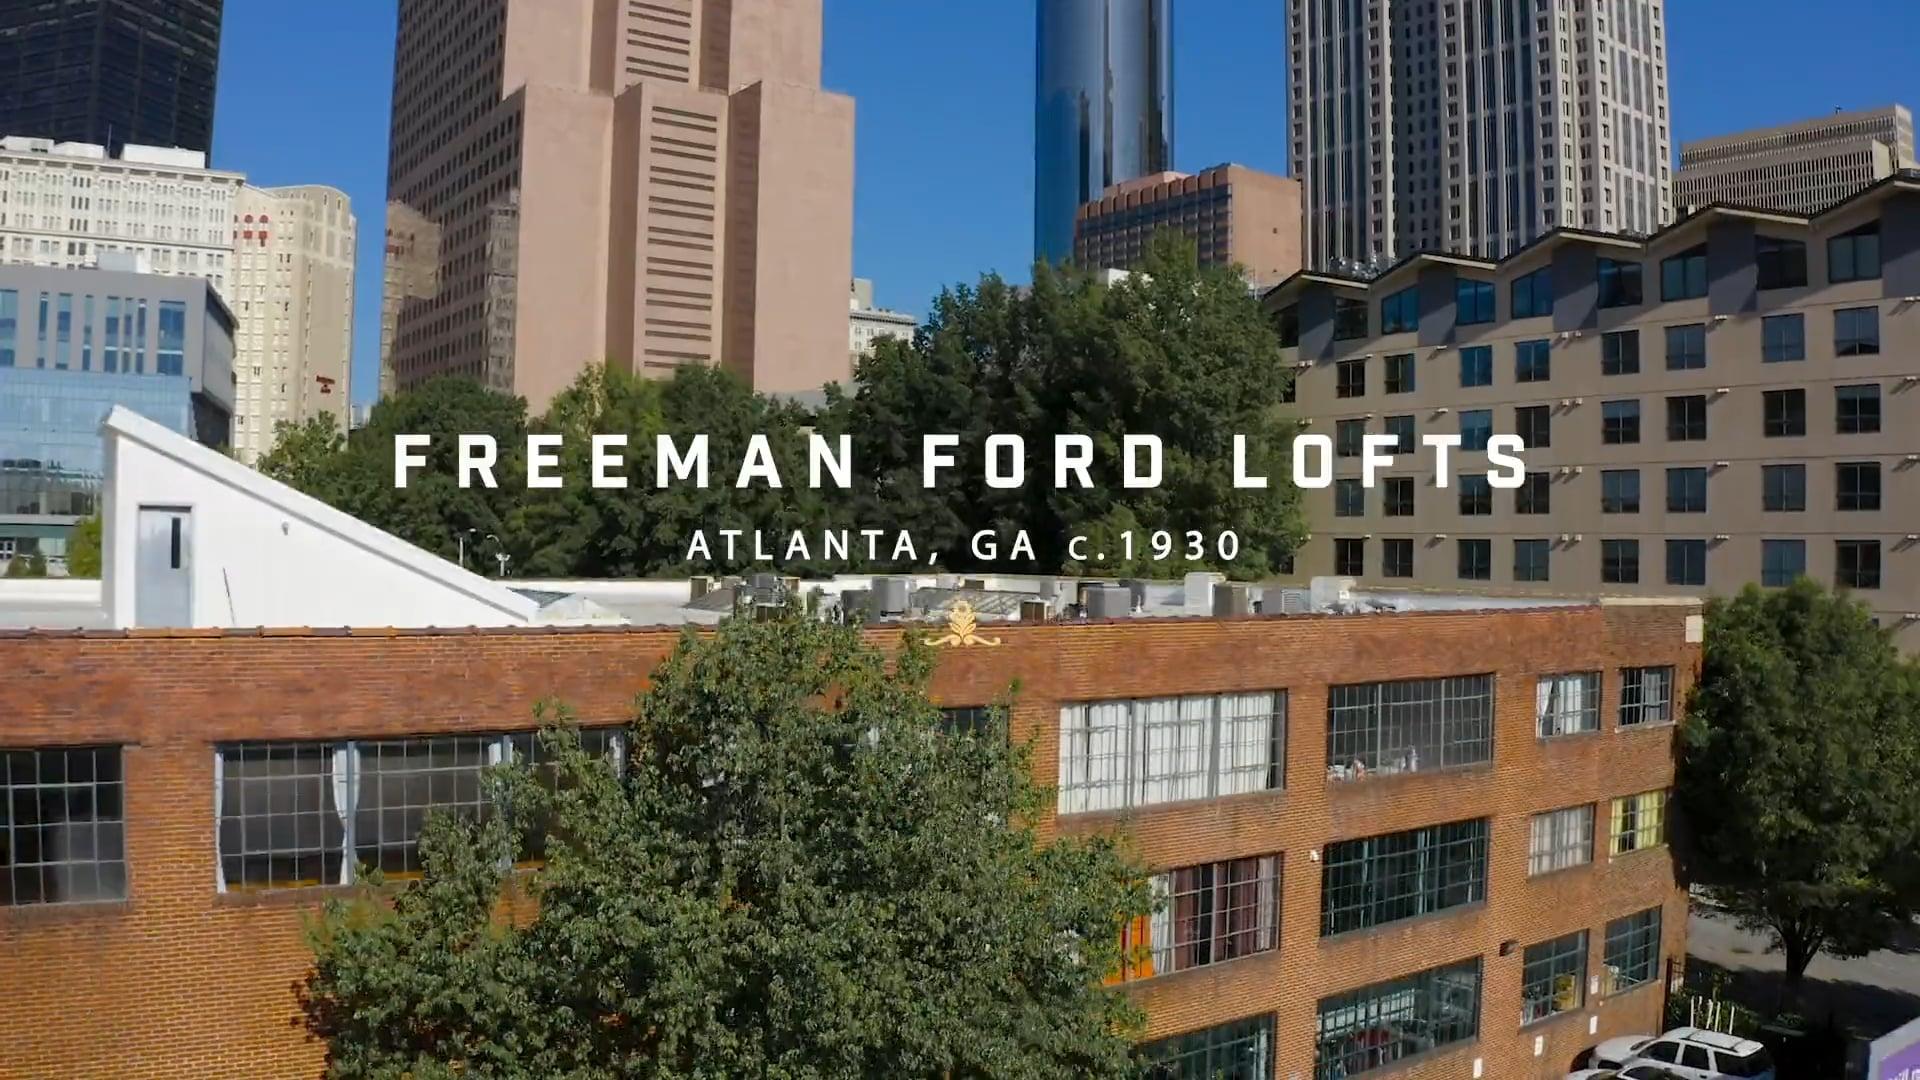 Freeman Ford Lofts Atlanta